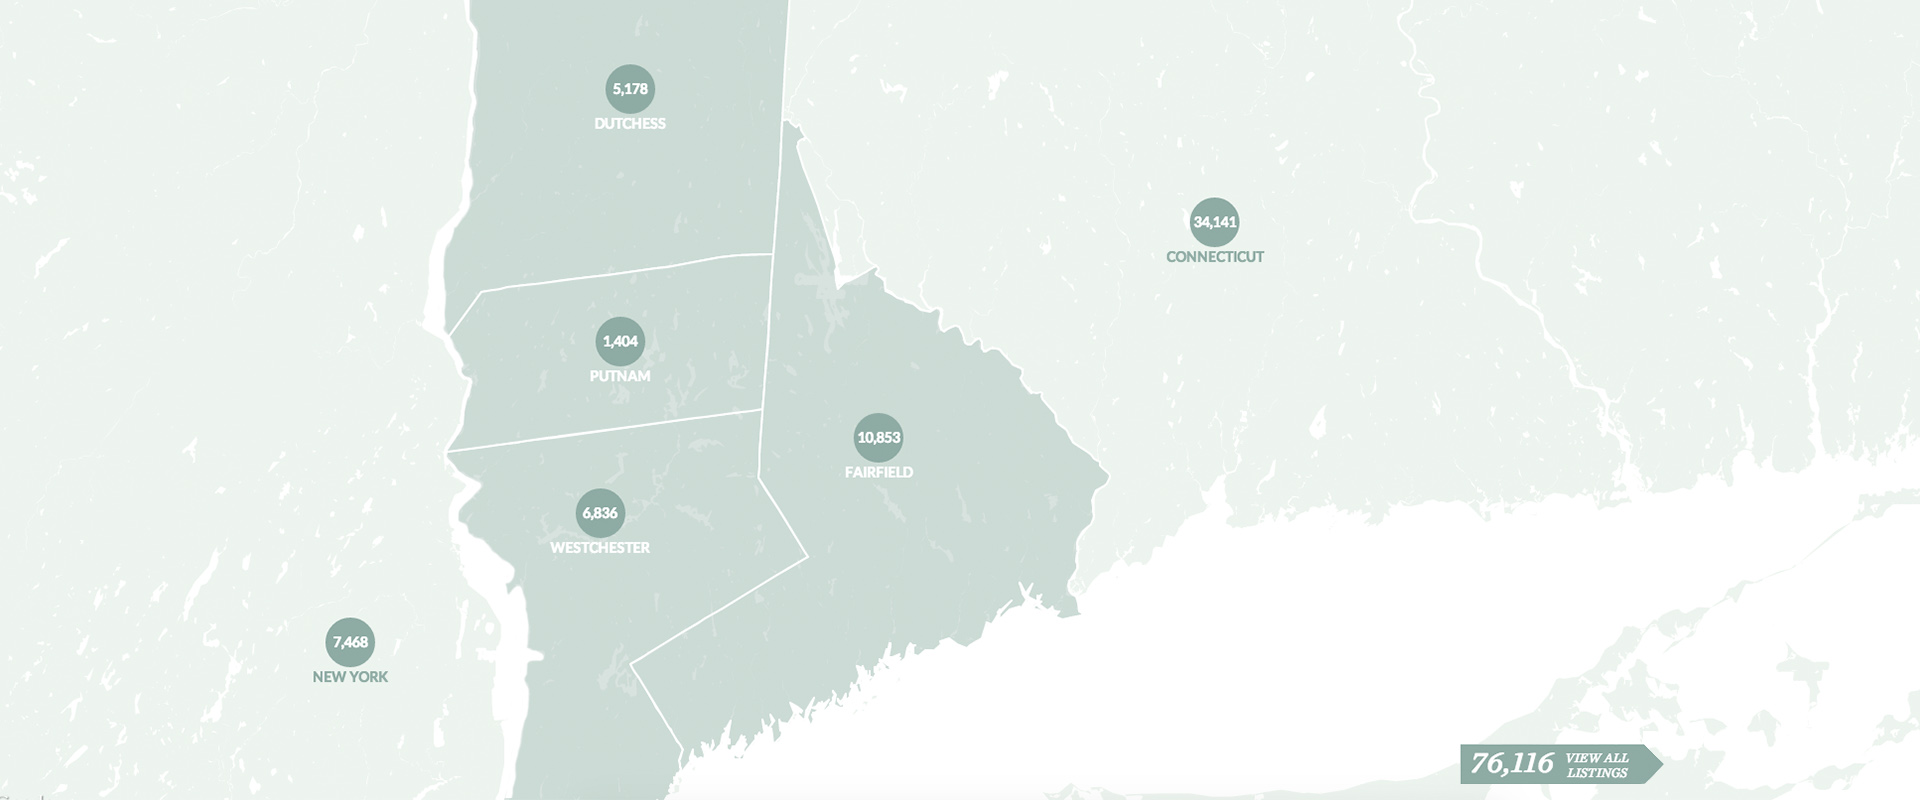 bluprint-case-studies-houlihan-lawrence-map.jpg